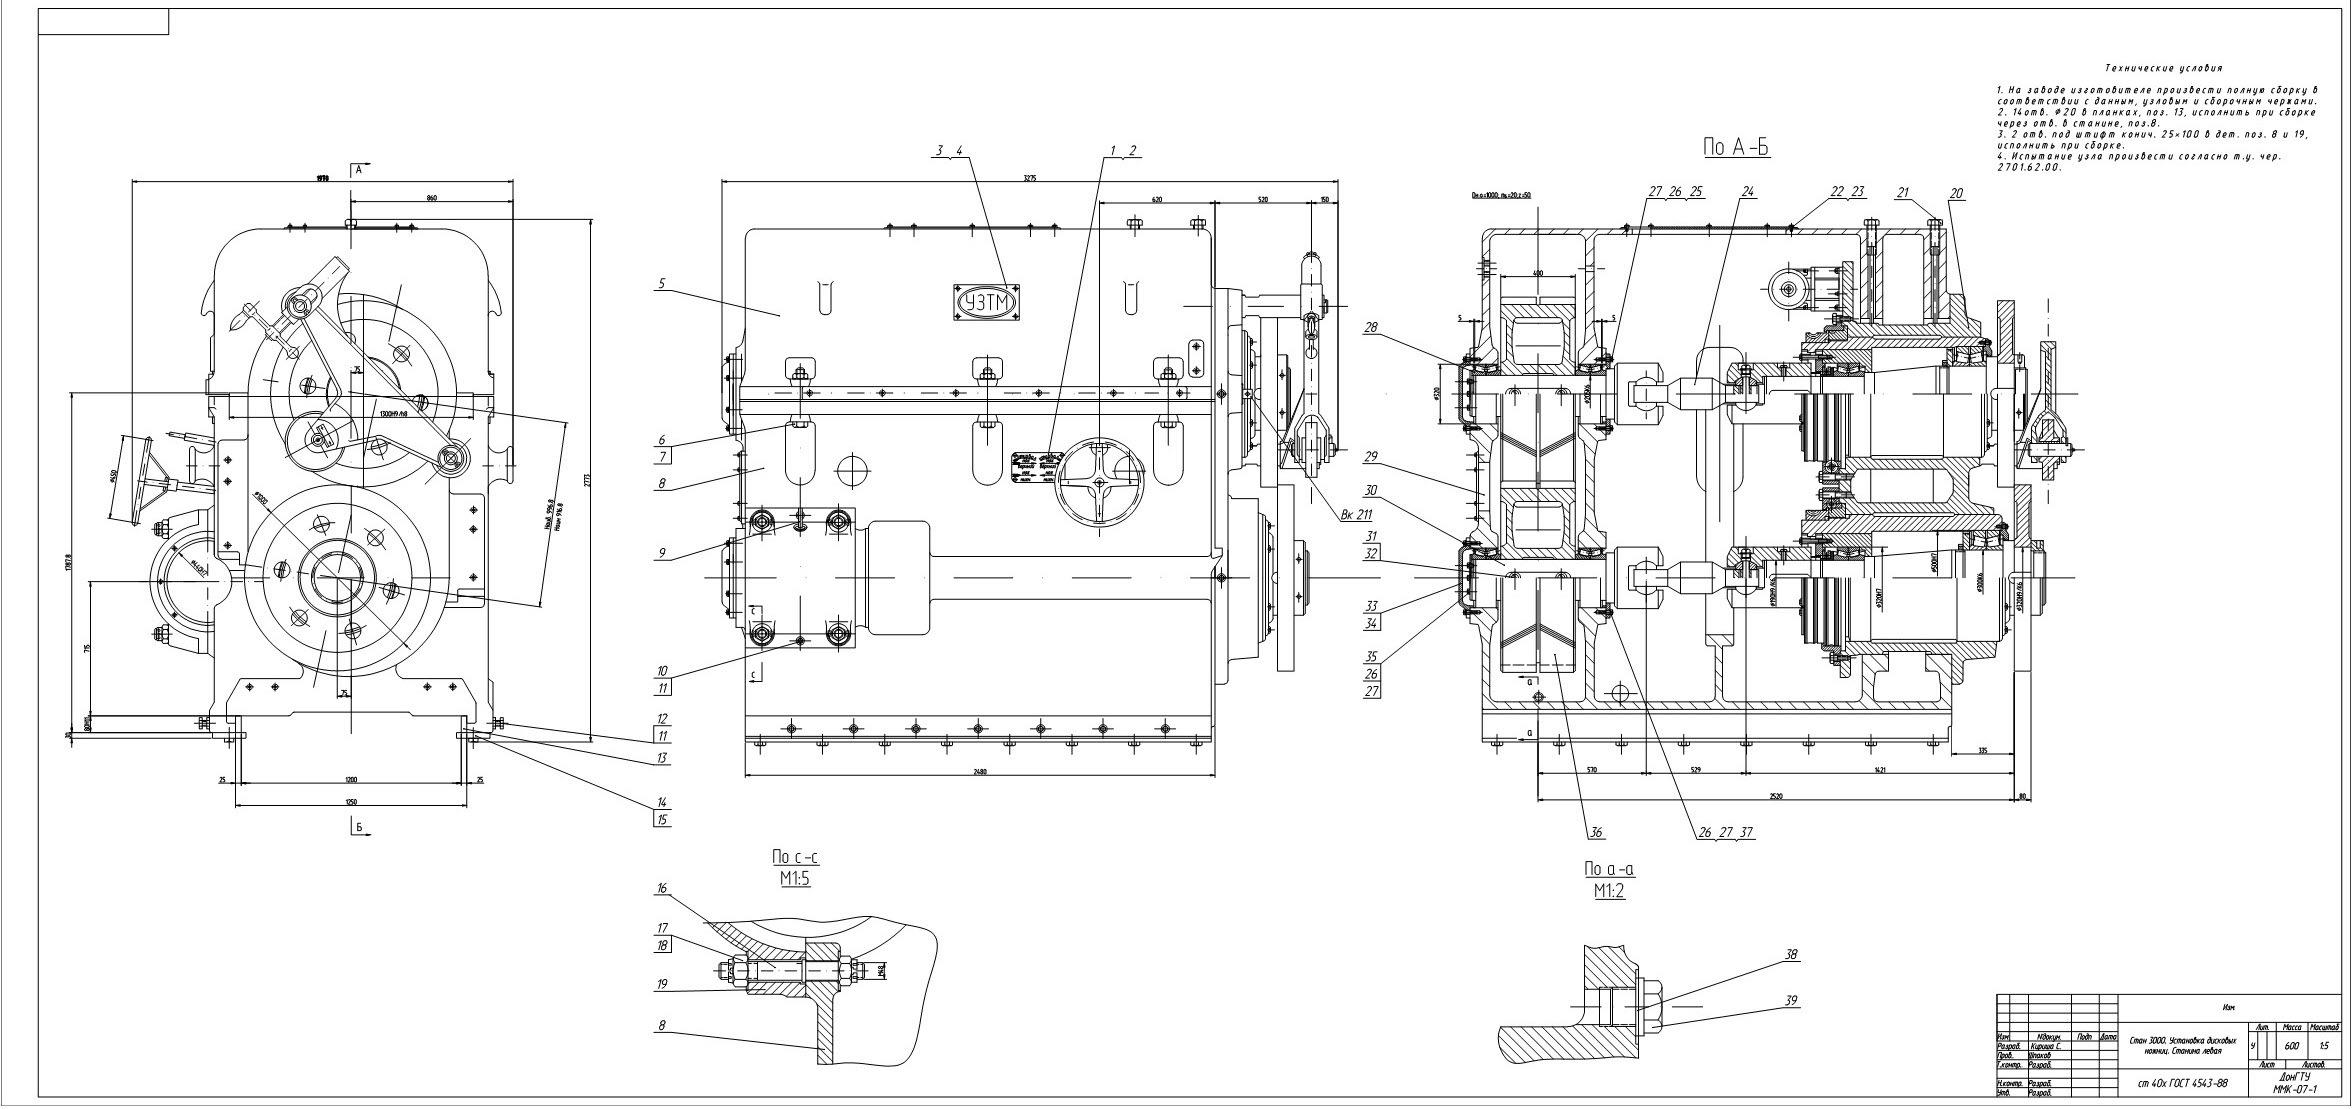 Привод дисковых ножниц ТЛЦ 3000